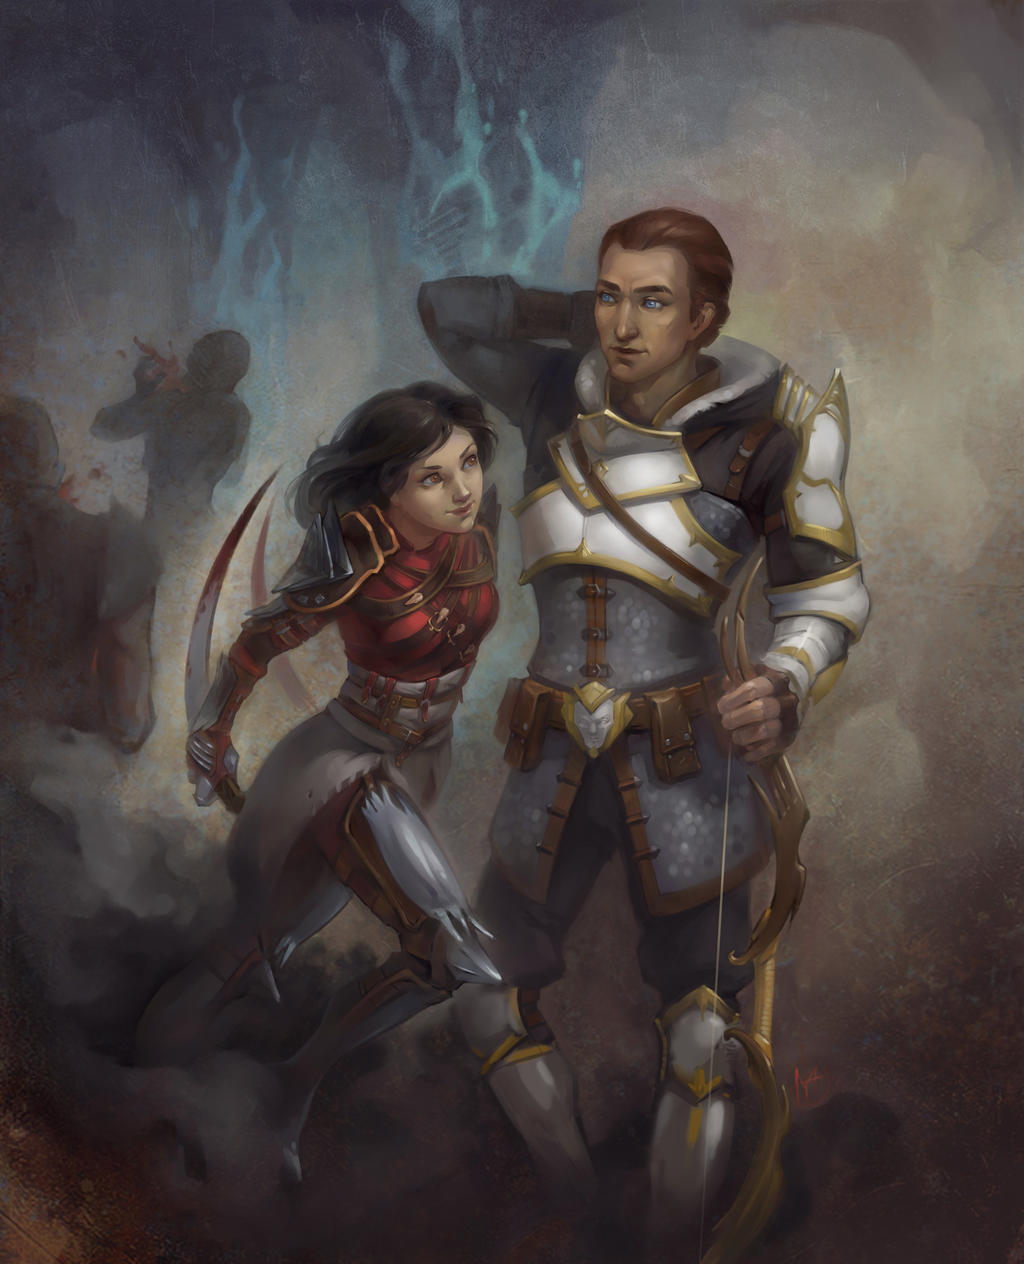 Da2 Rogue By Alteya On DeviantArt